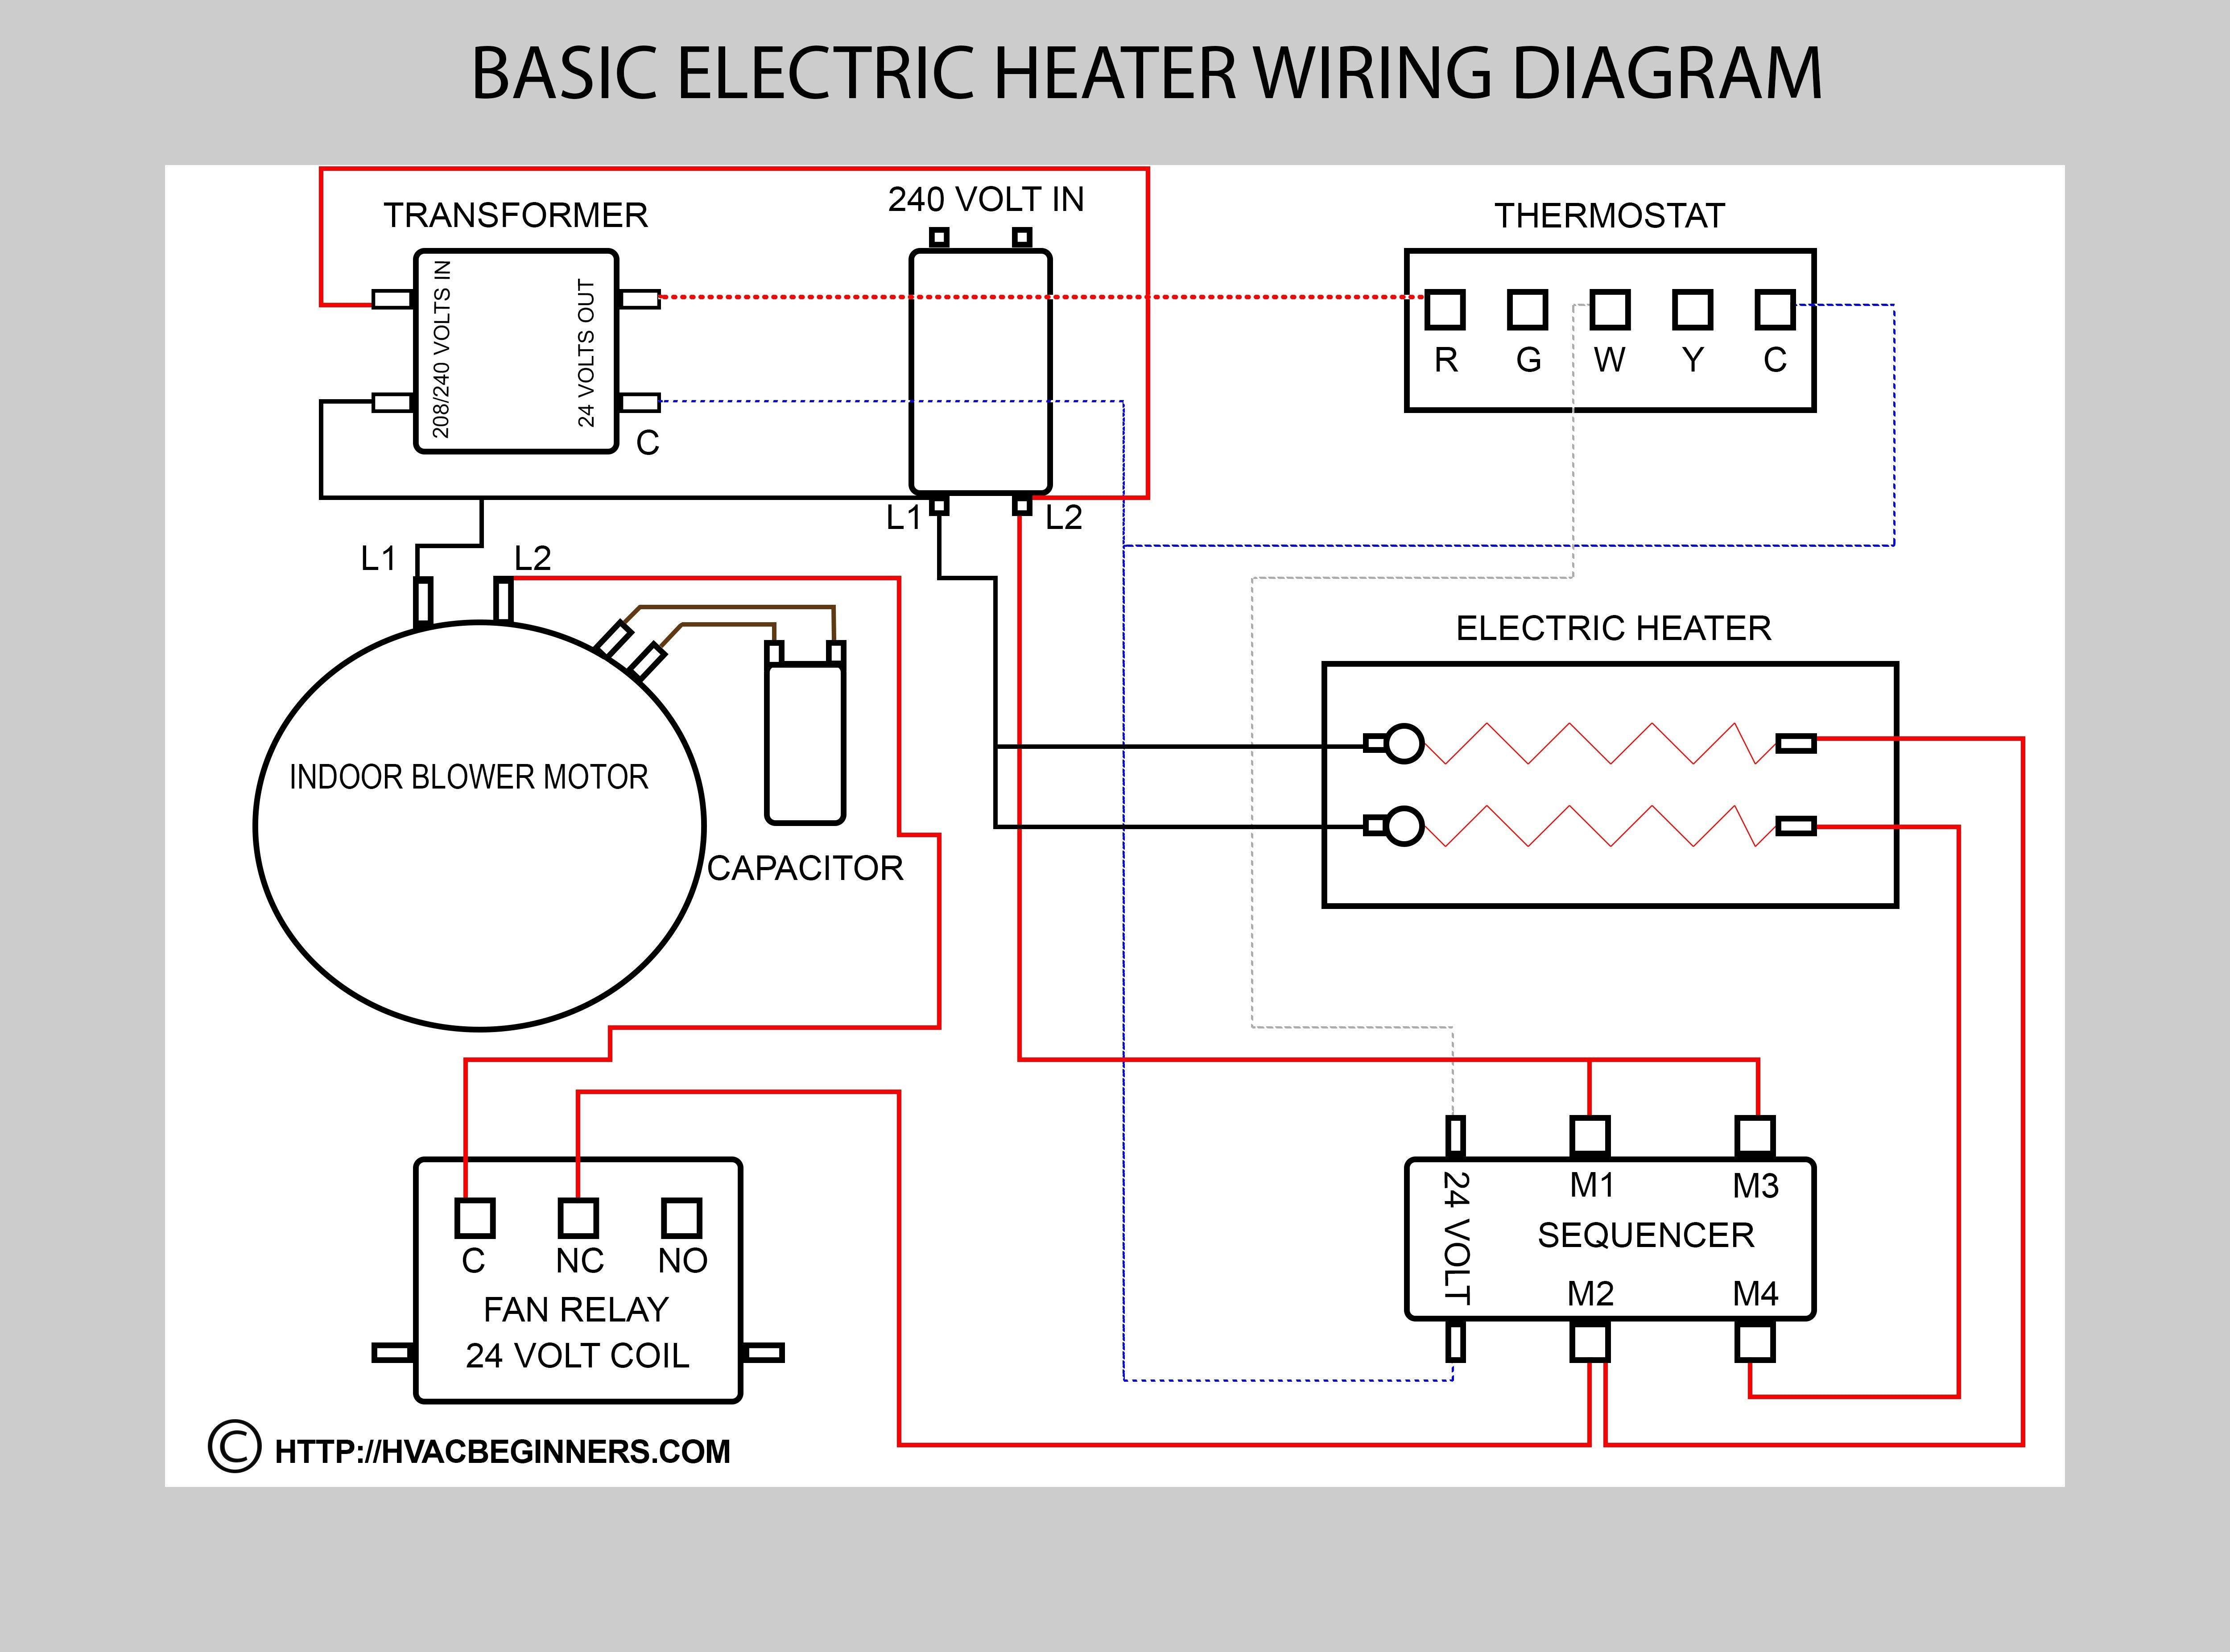 Unique Wiring Colors Diagram Wiringdiagram Diagramming Diagramm Visuals Vis Electrical Circuit Diagram Electrical Wiring Diagram Diagram Design